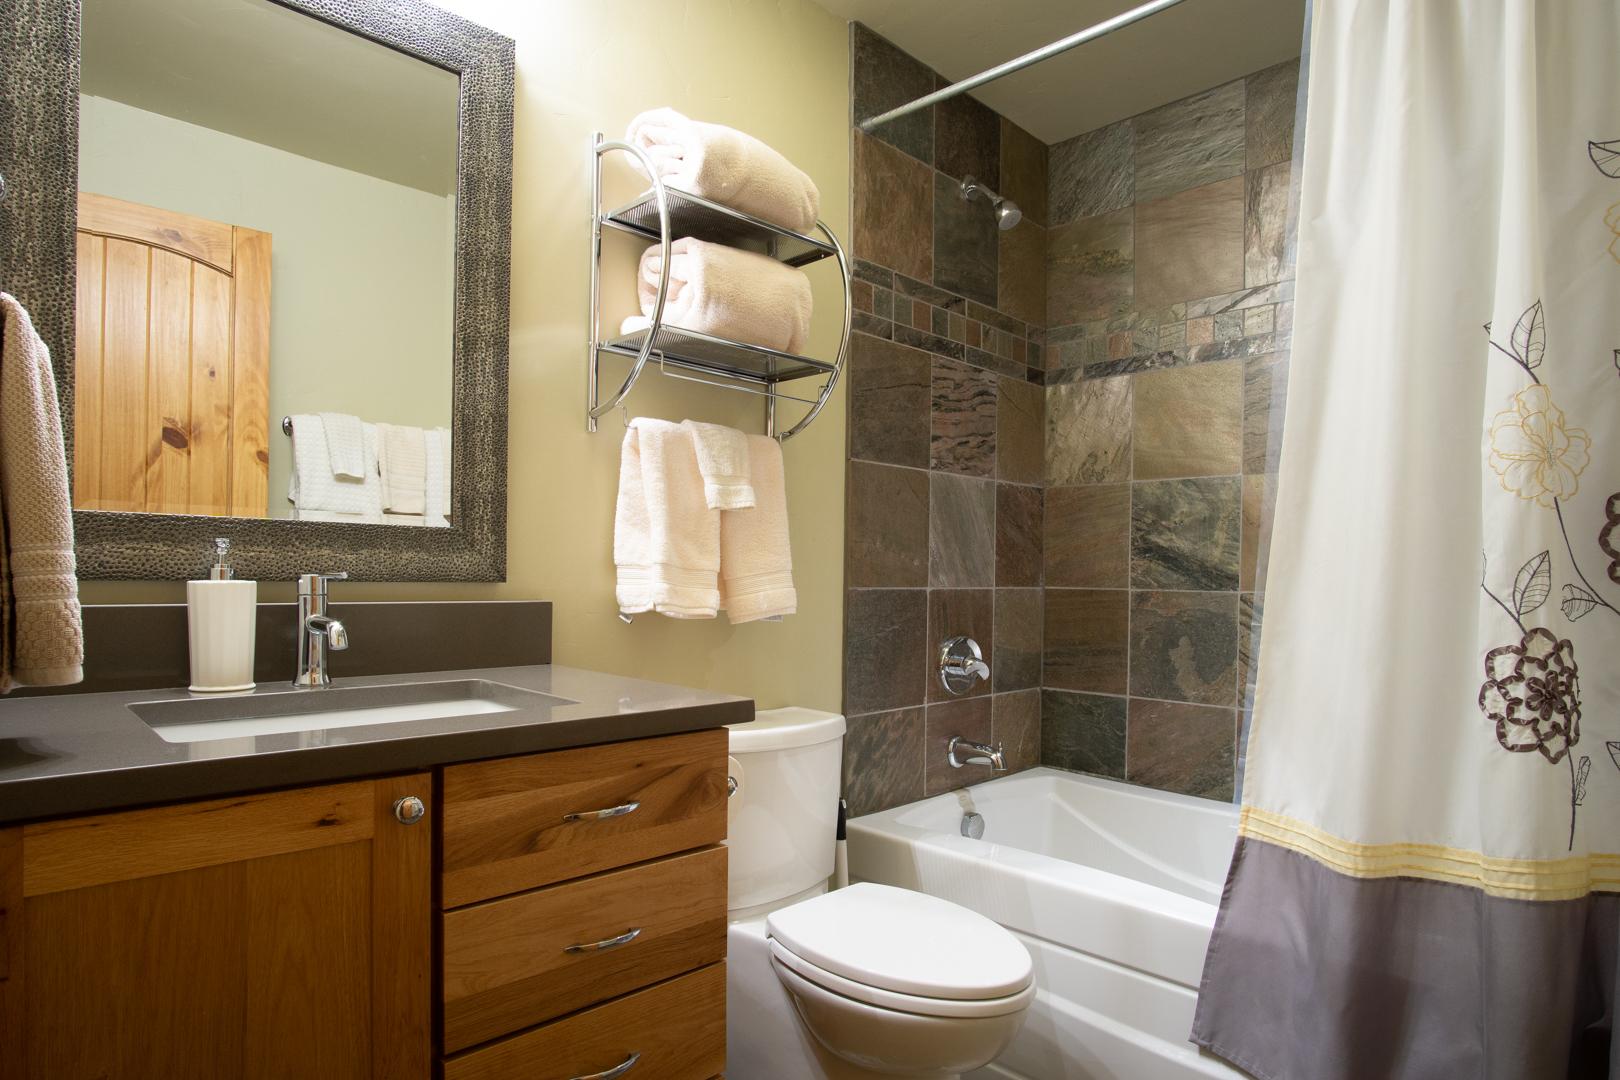 Downstair bathroom.